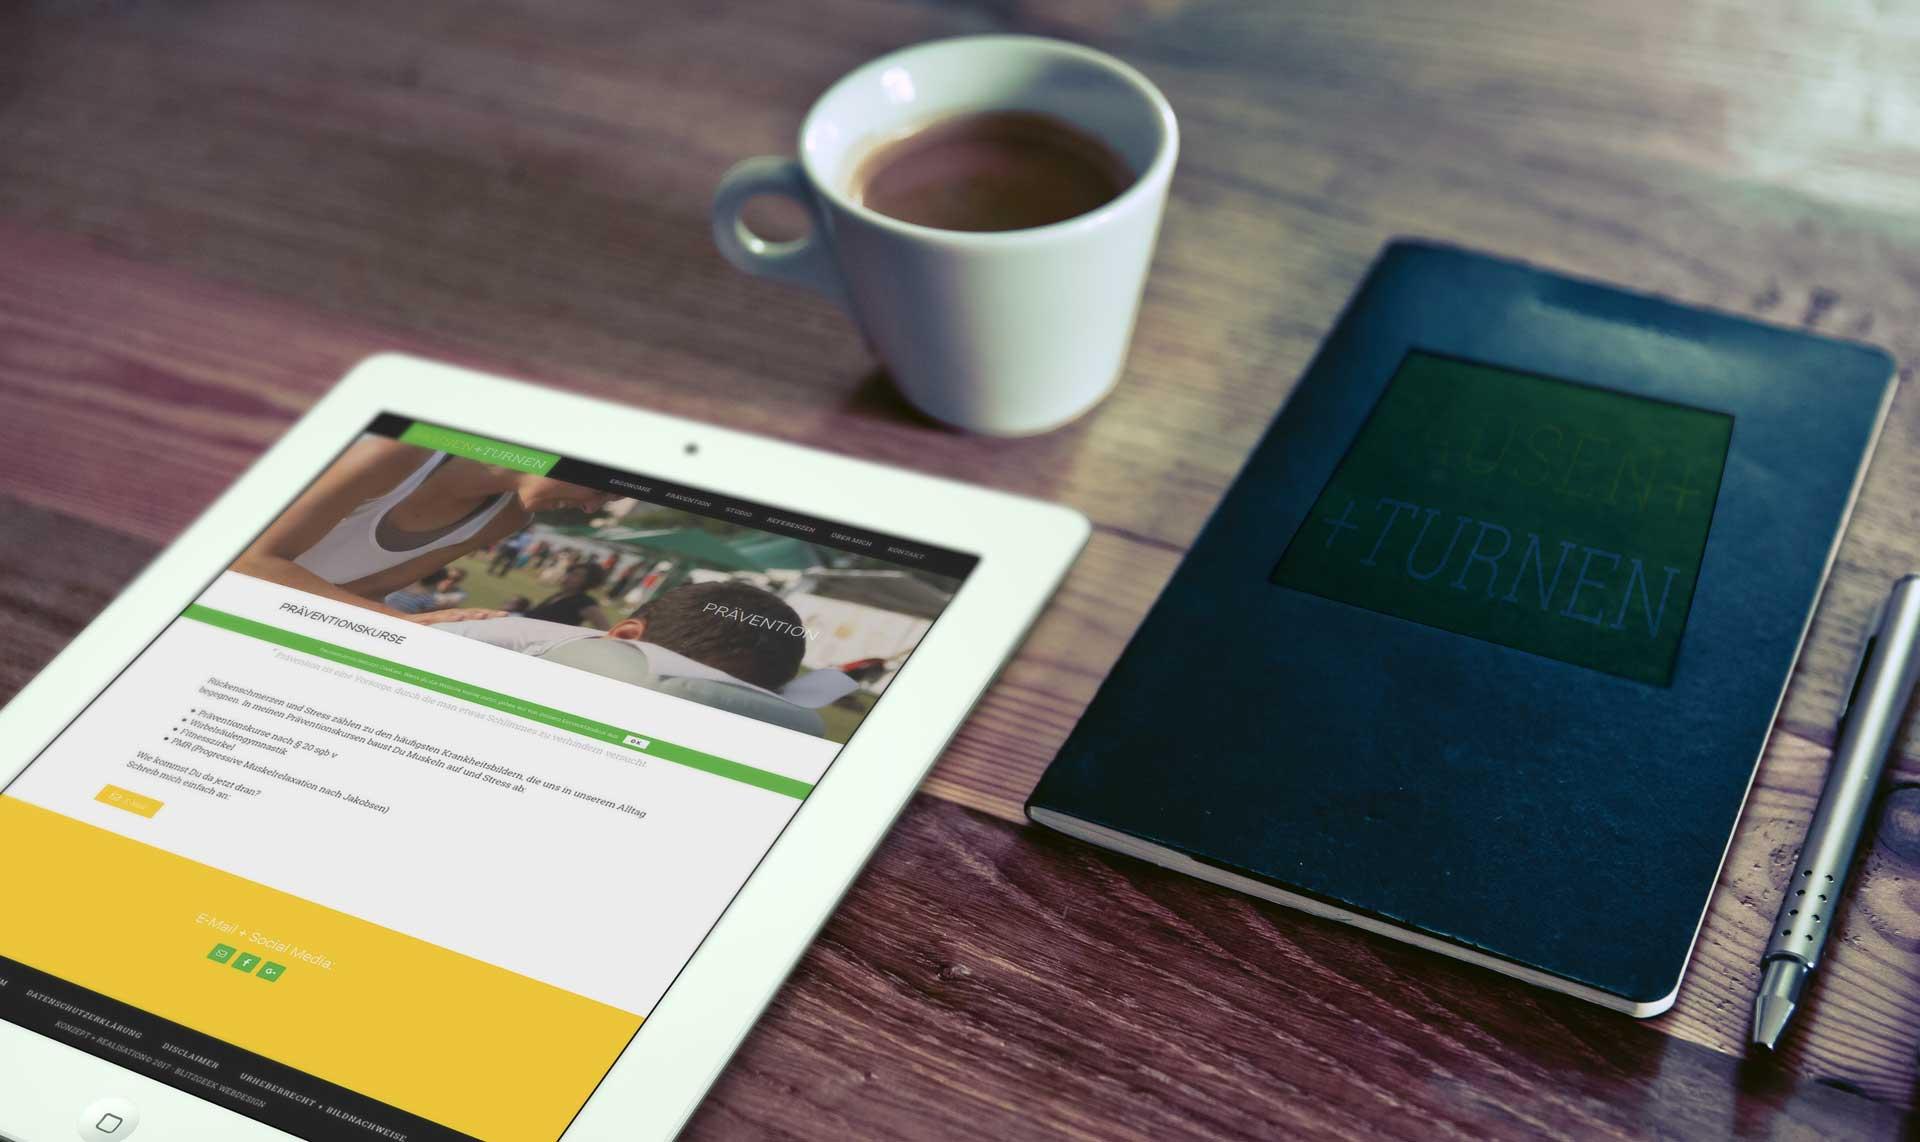 Kaffeetasse, iPad, Buch mit Pausenturnen Logo